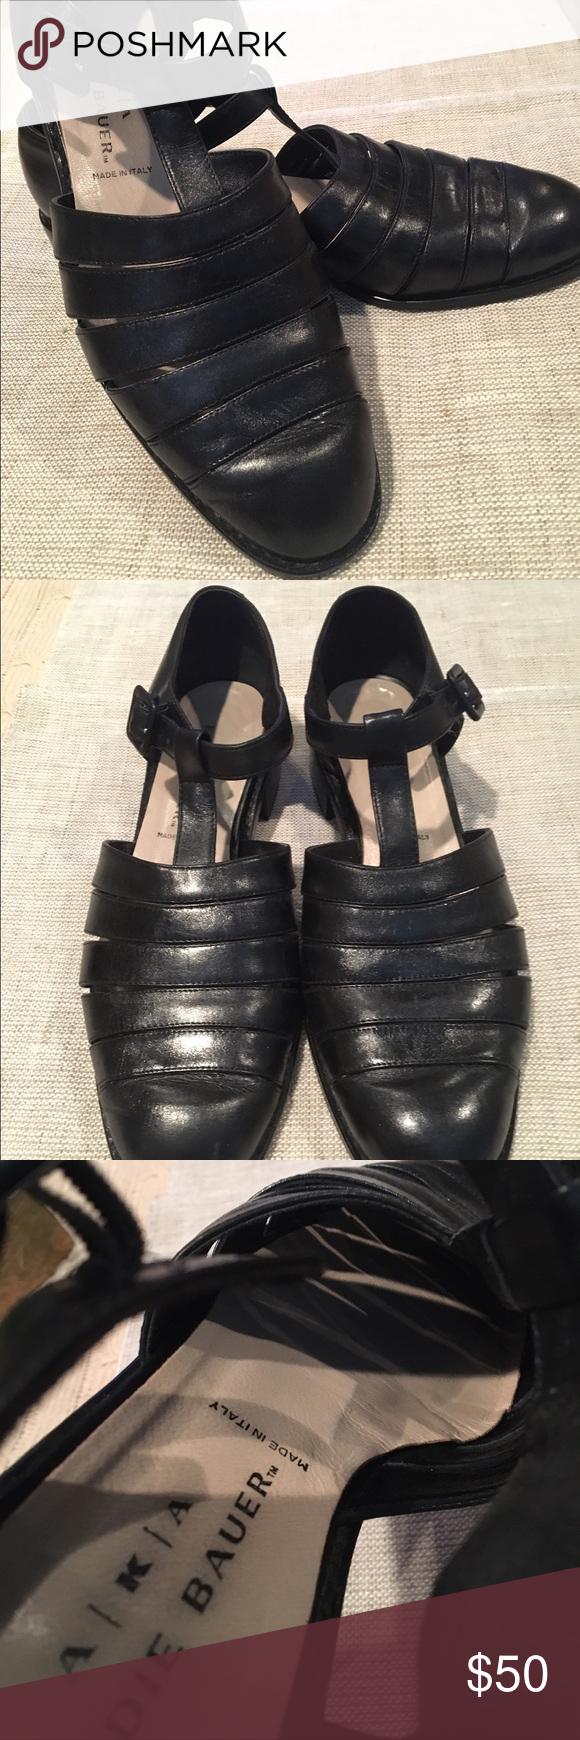 AKA Eddie Bauer leather fisherman sandals (Sz 8.5M